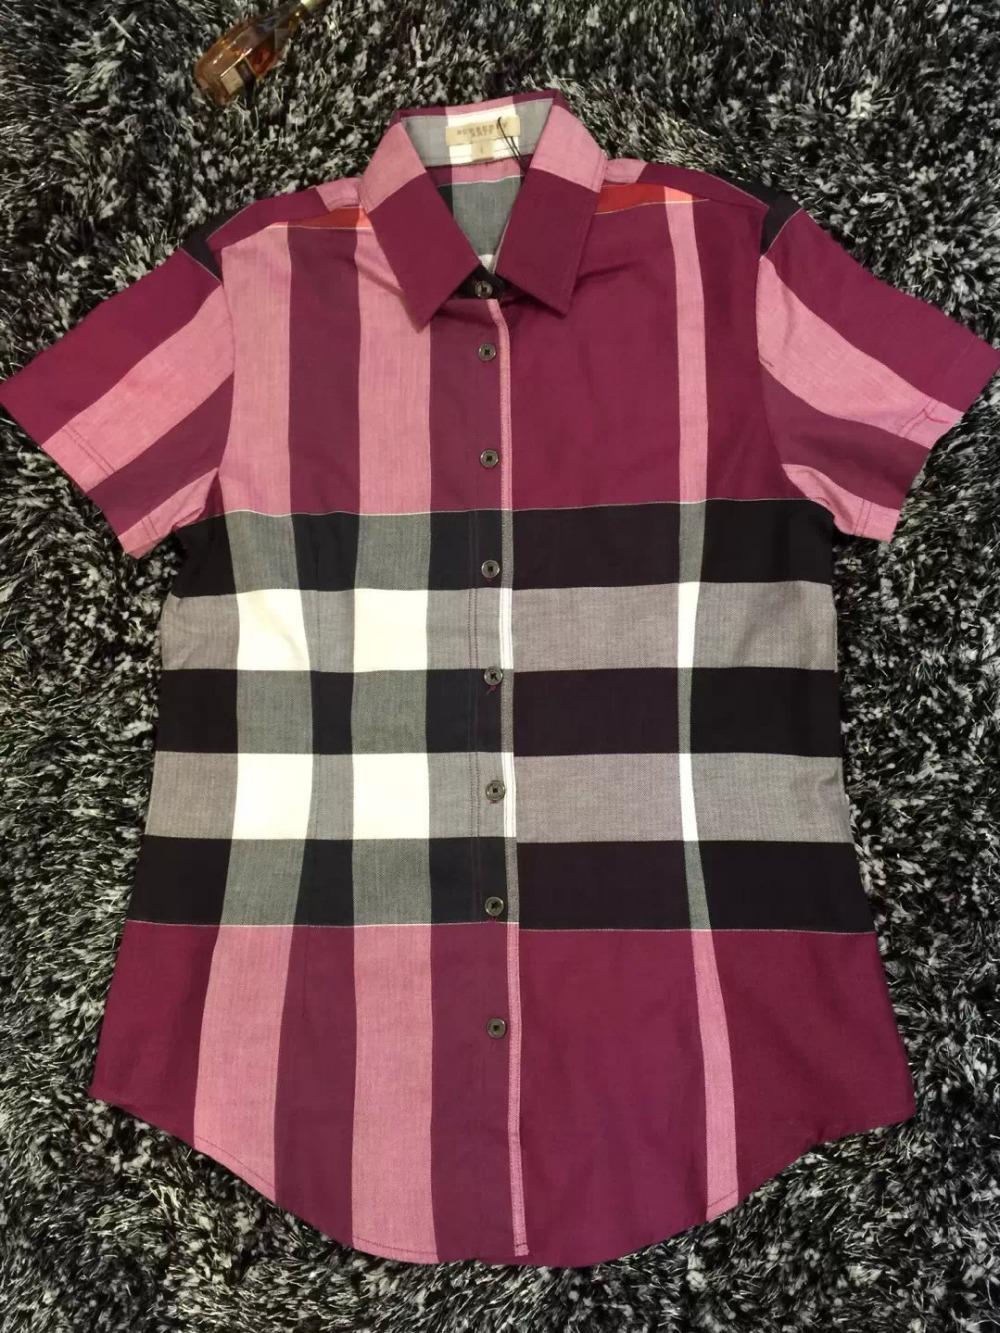 Hot Women Fashion British Brand Summer Turn-down Short Sleeve Big Plaid Casual Shirts/Designer Big Check Tops/Blouse T-shirts(China (Mainland))